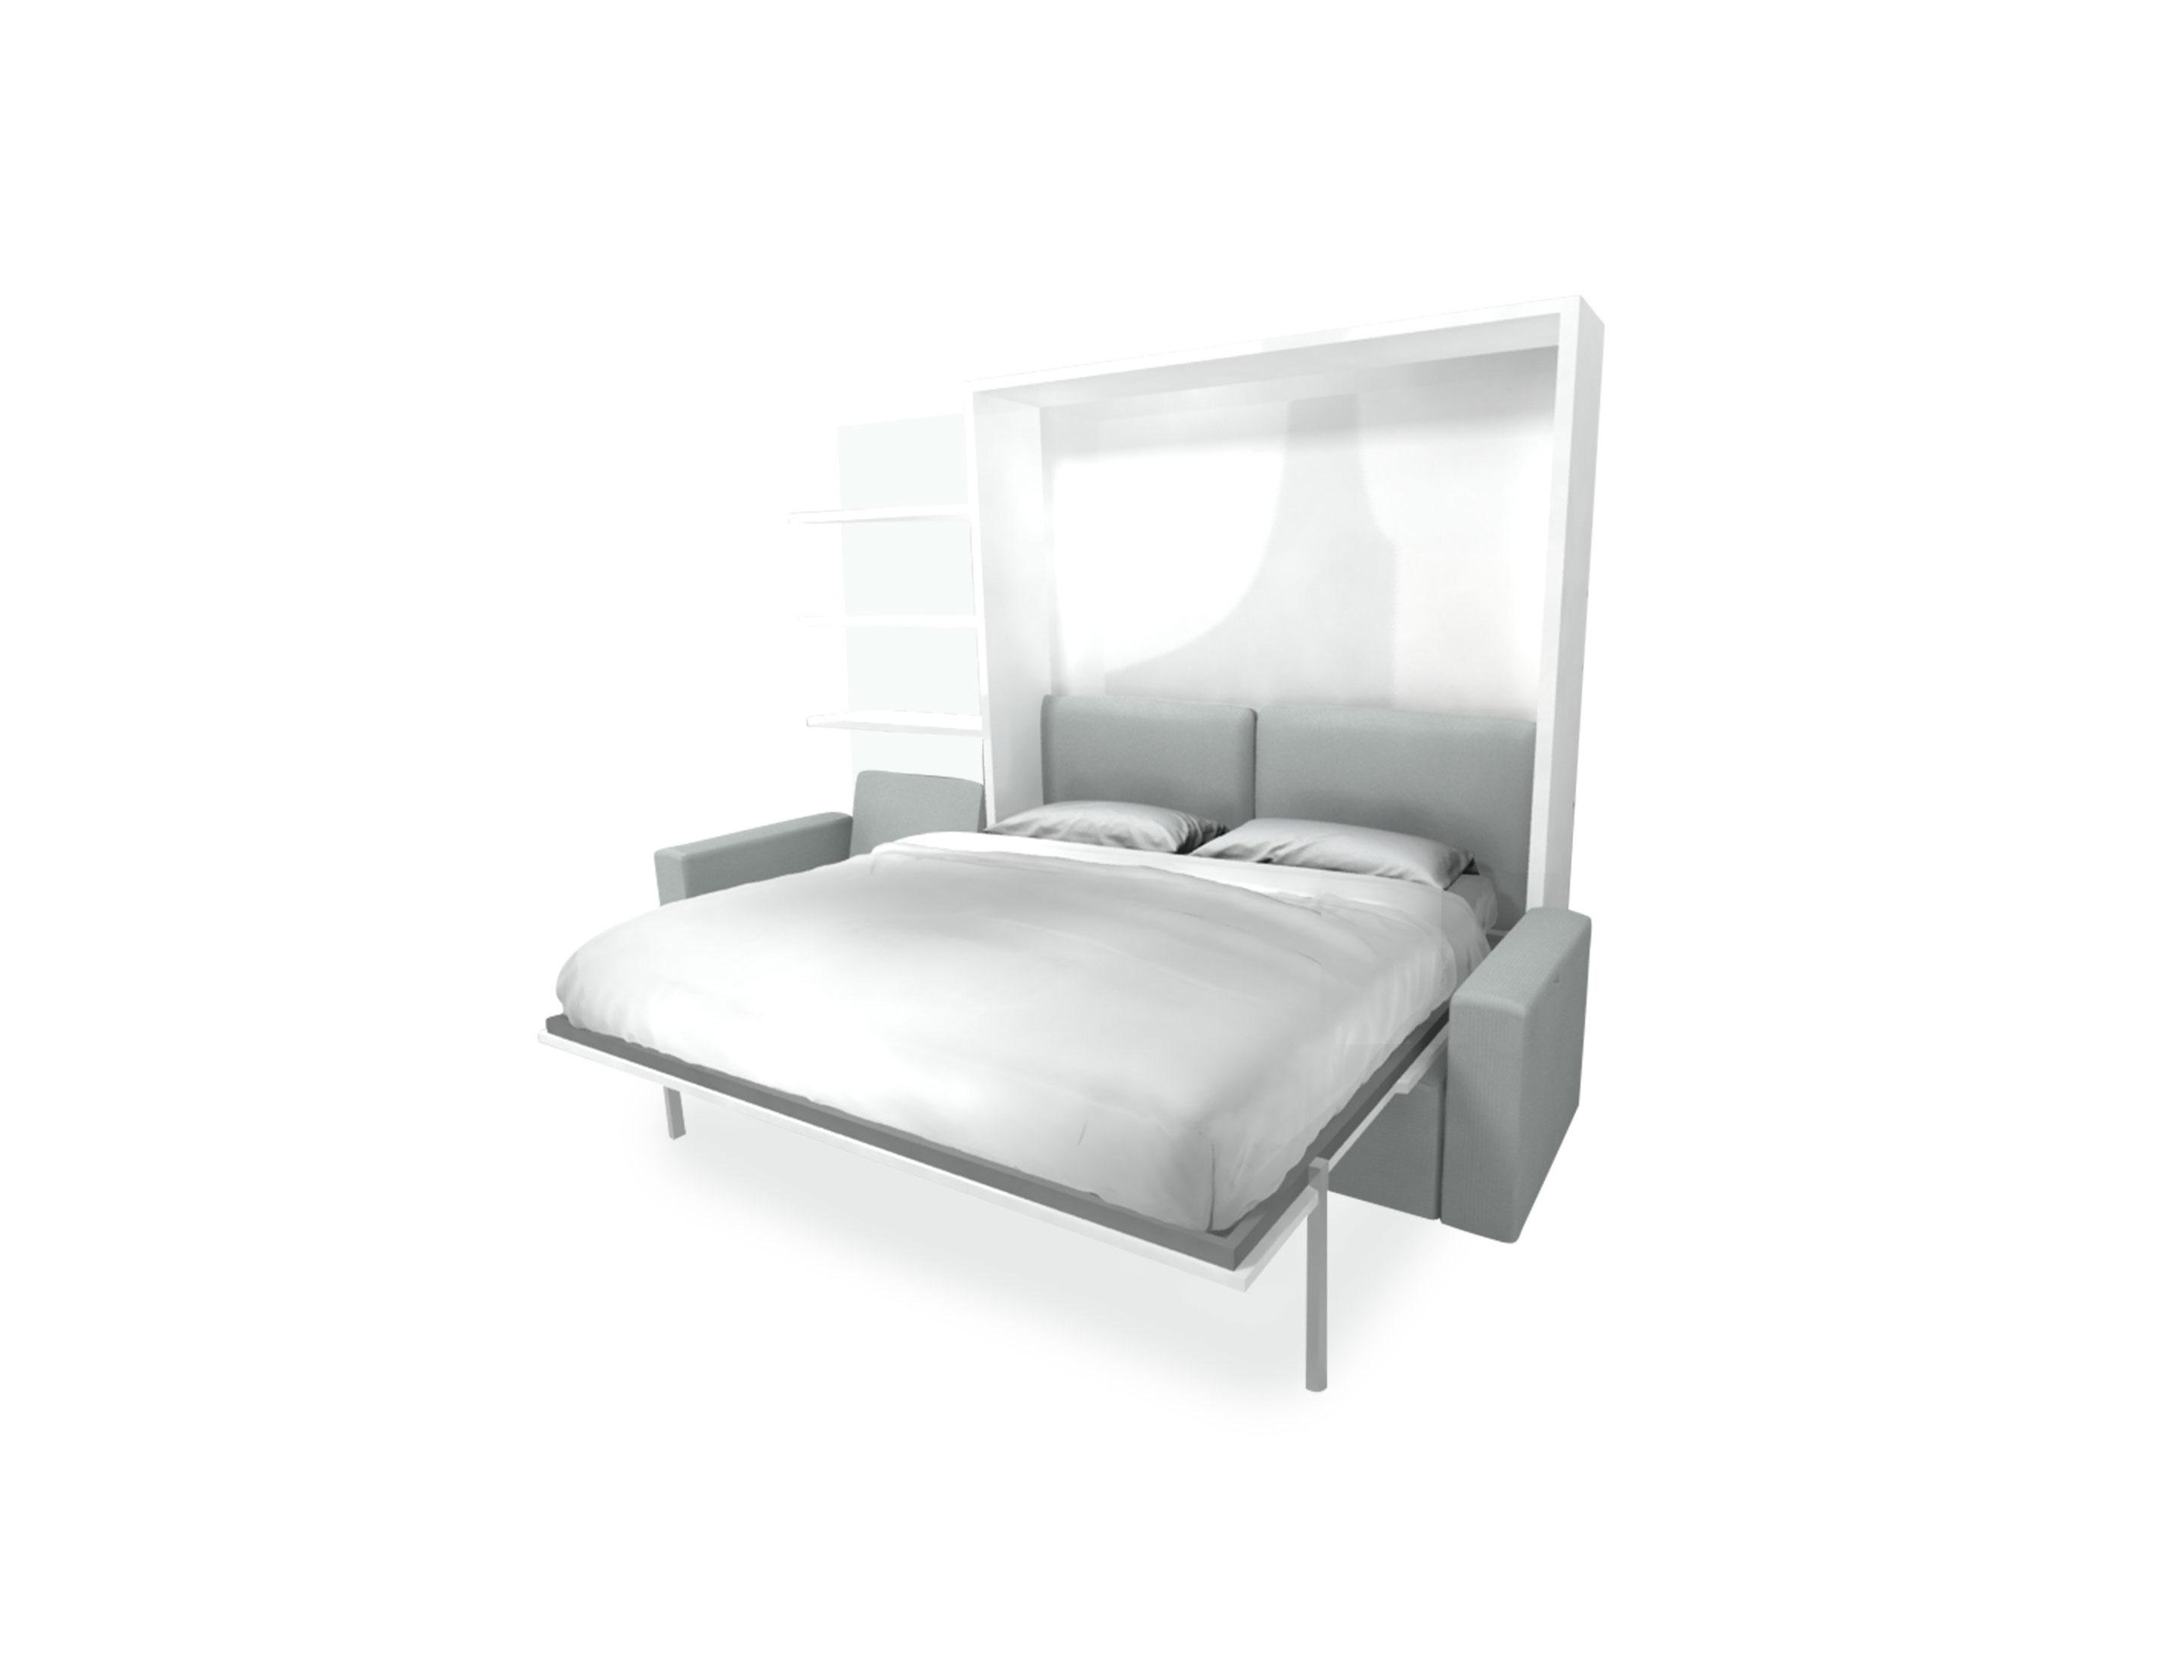 murphysofa clean king wall bed sectional